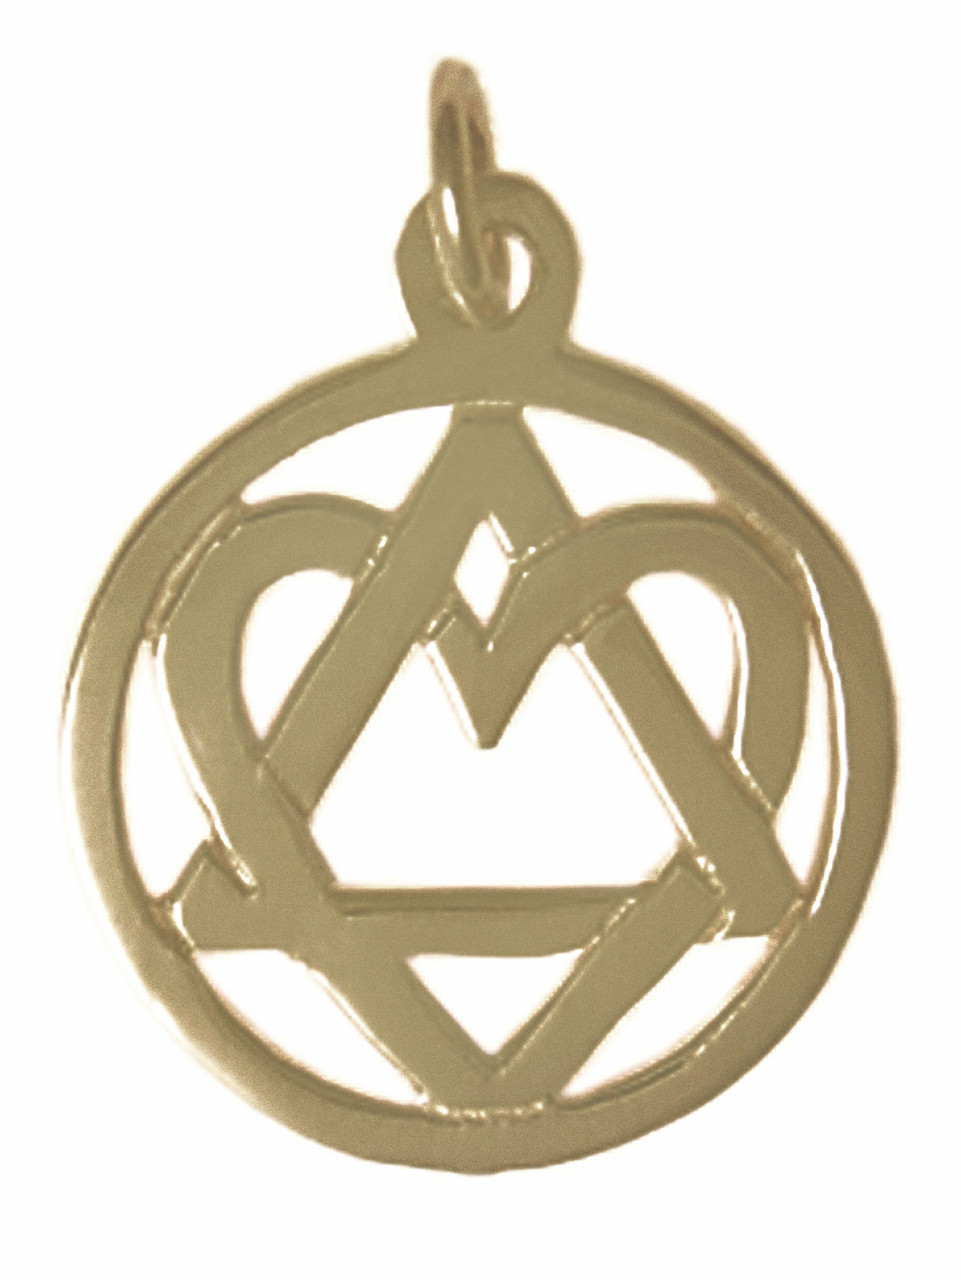 Style 19 4 brass aa symbol pendant wopen heart love service style 19 4 brass aa symbol pendant wopen heart buycottarizona Gallery